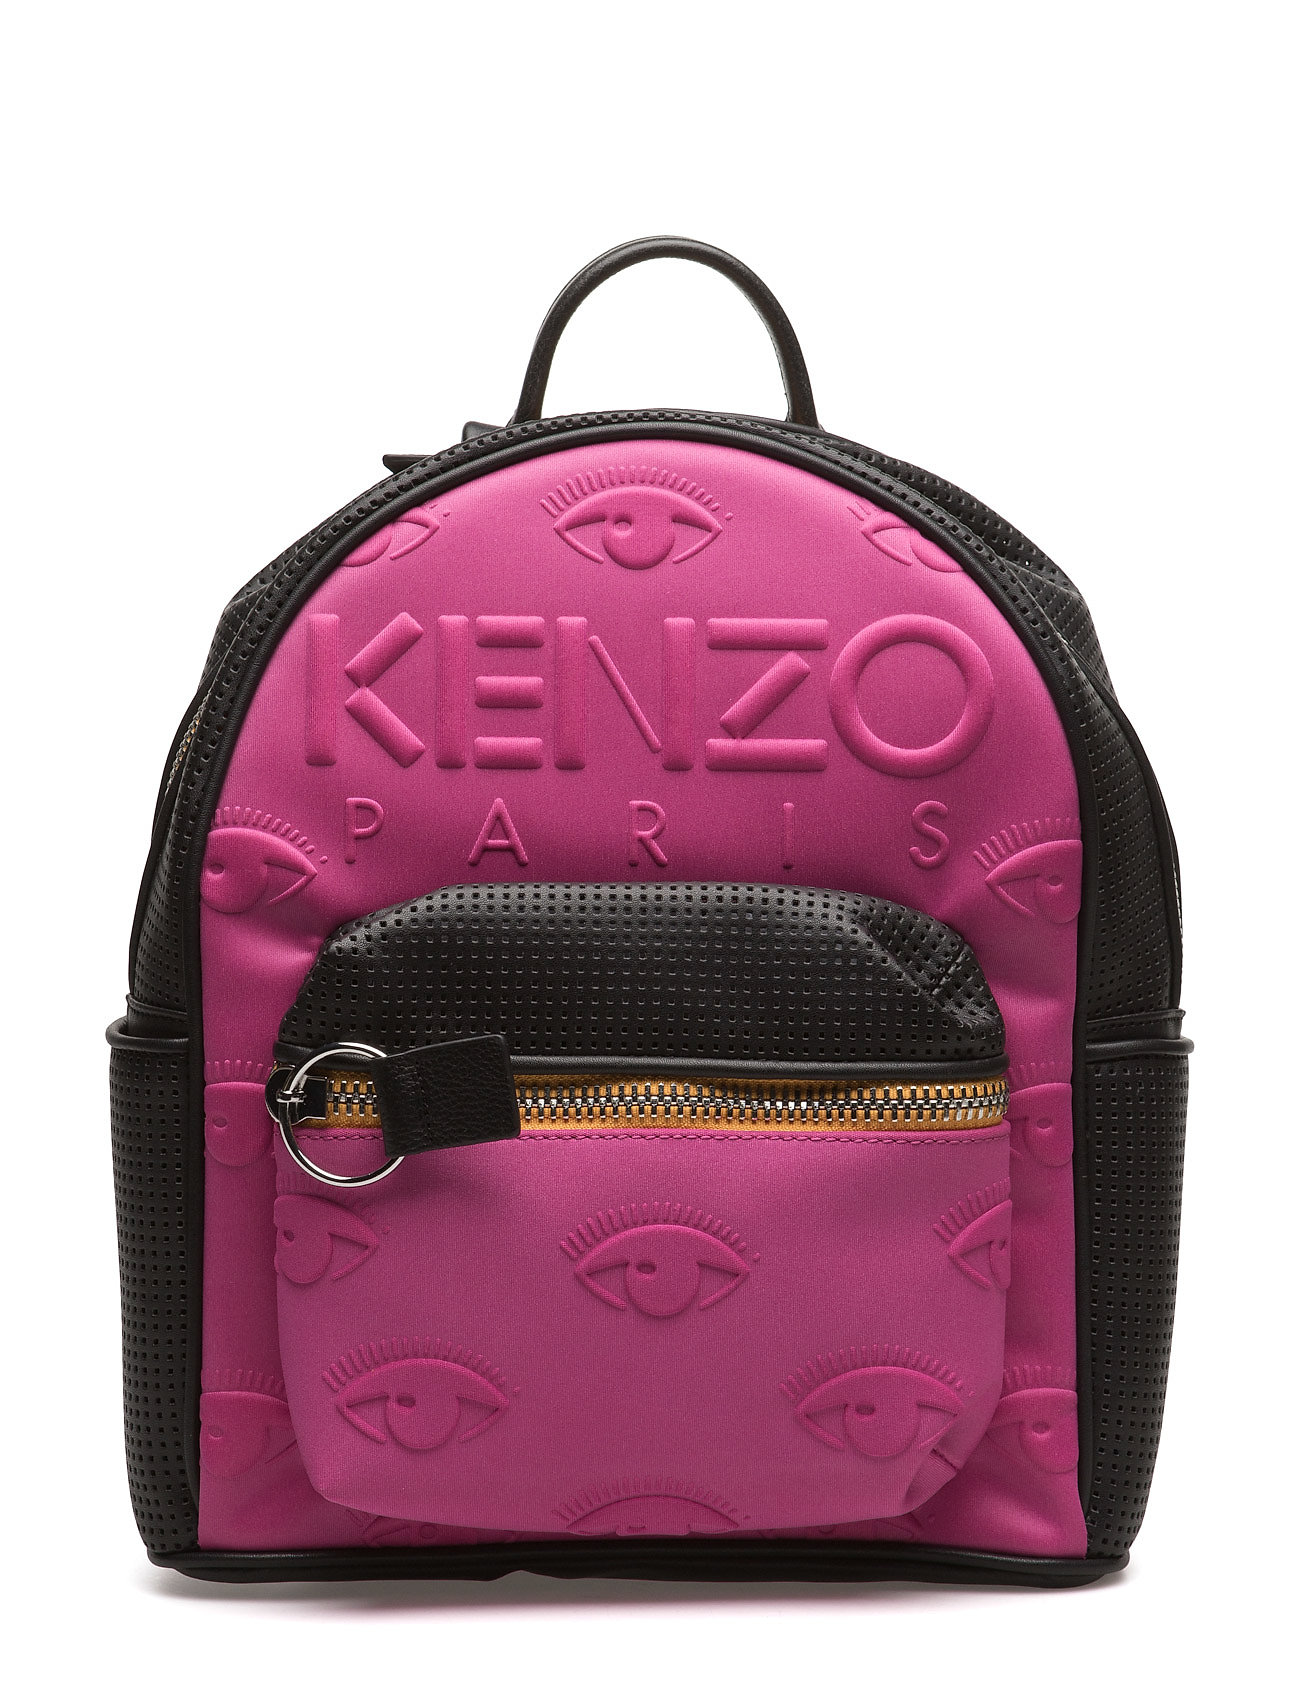 kenzo – Bag has back main på boozt.com dk